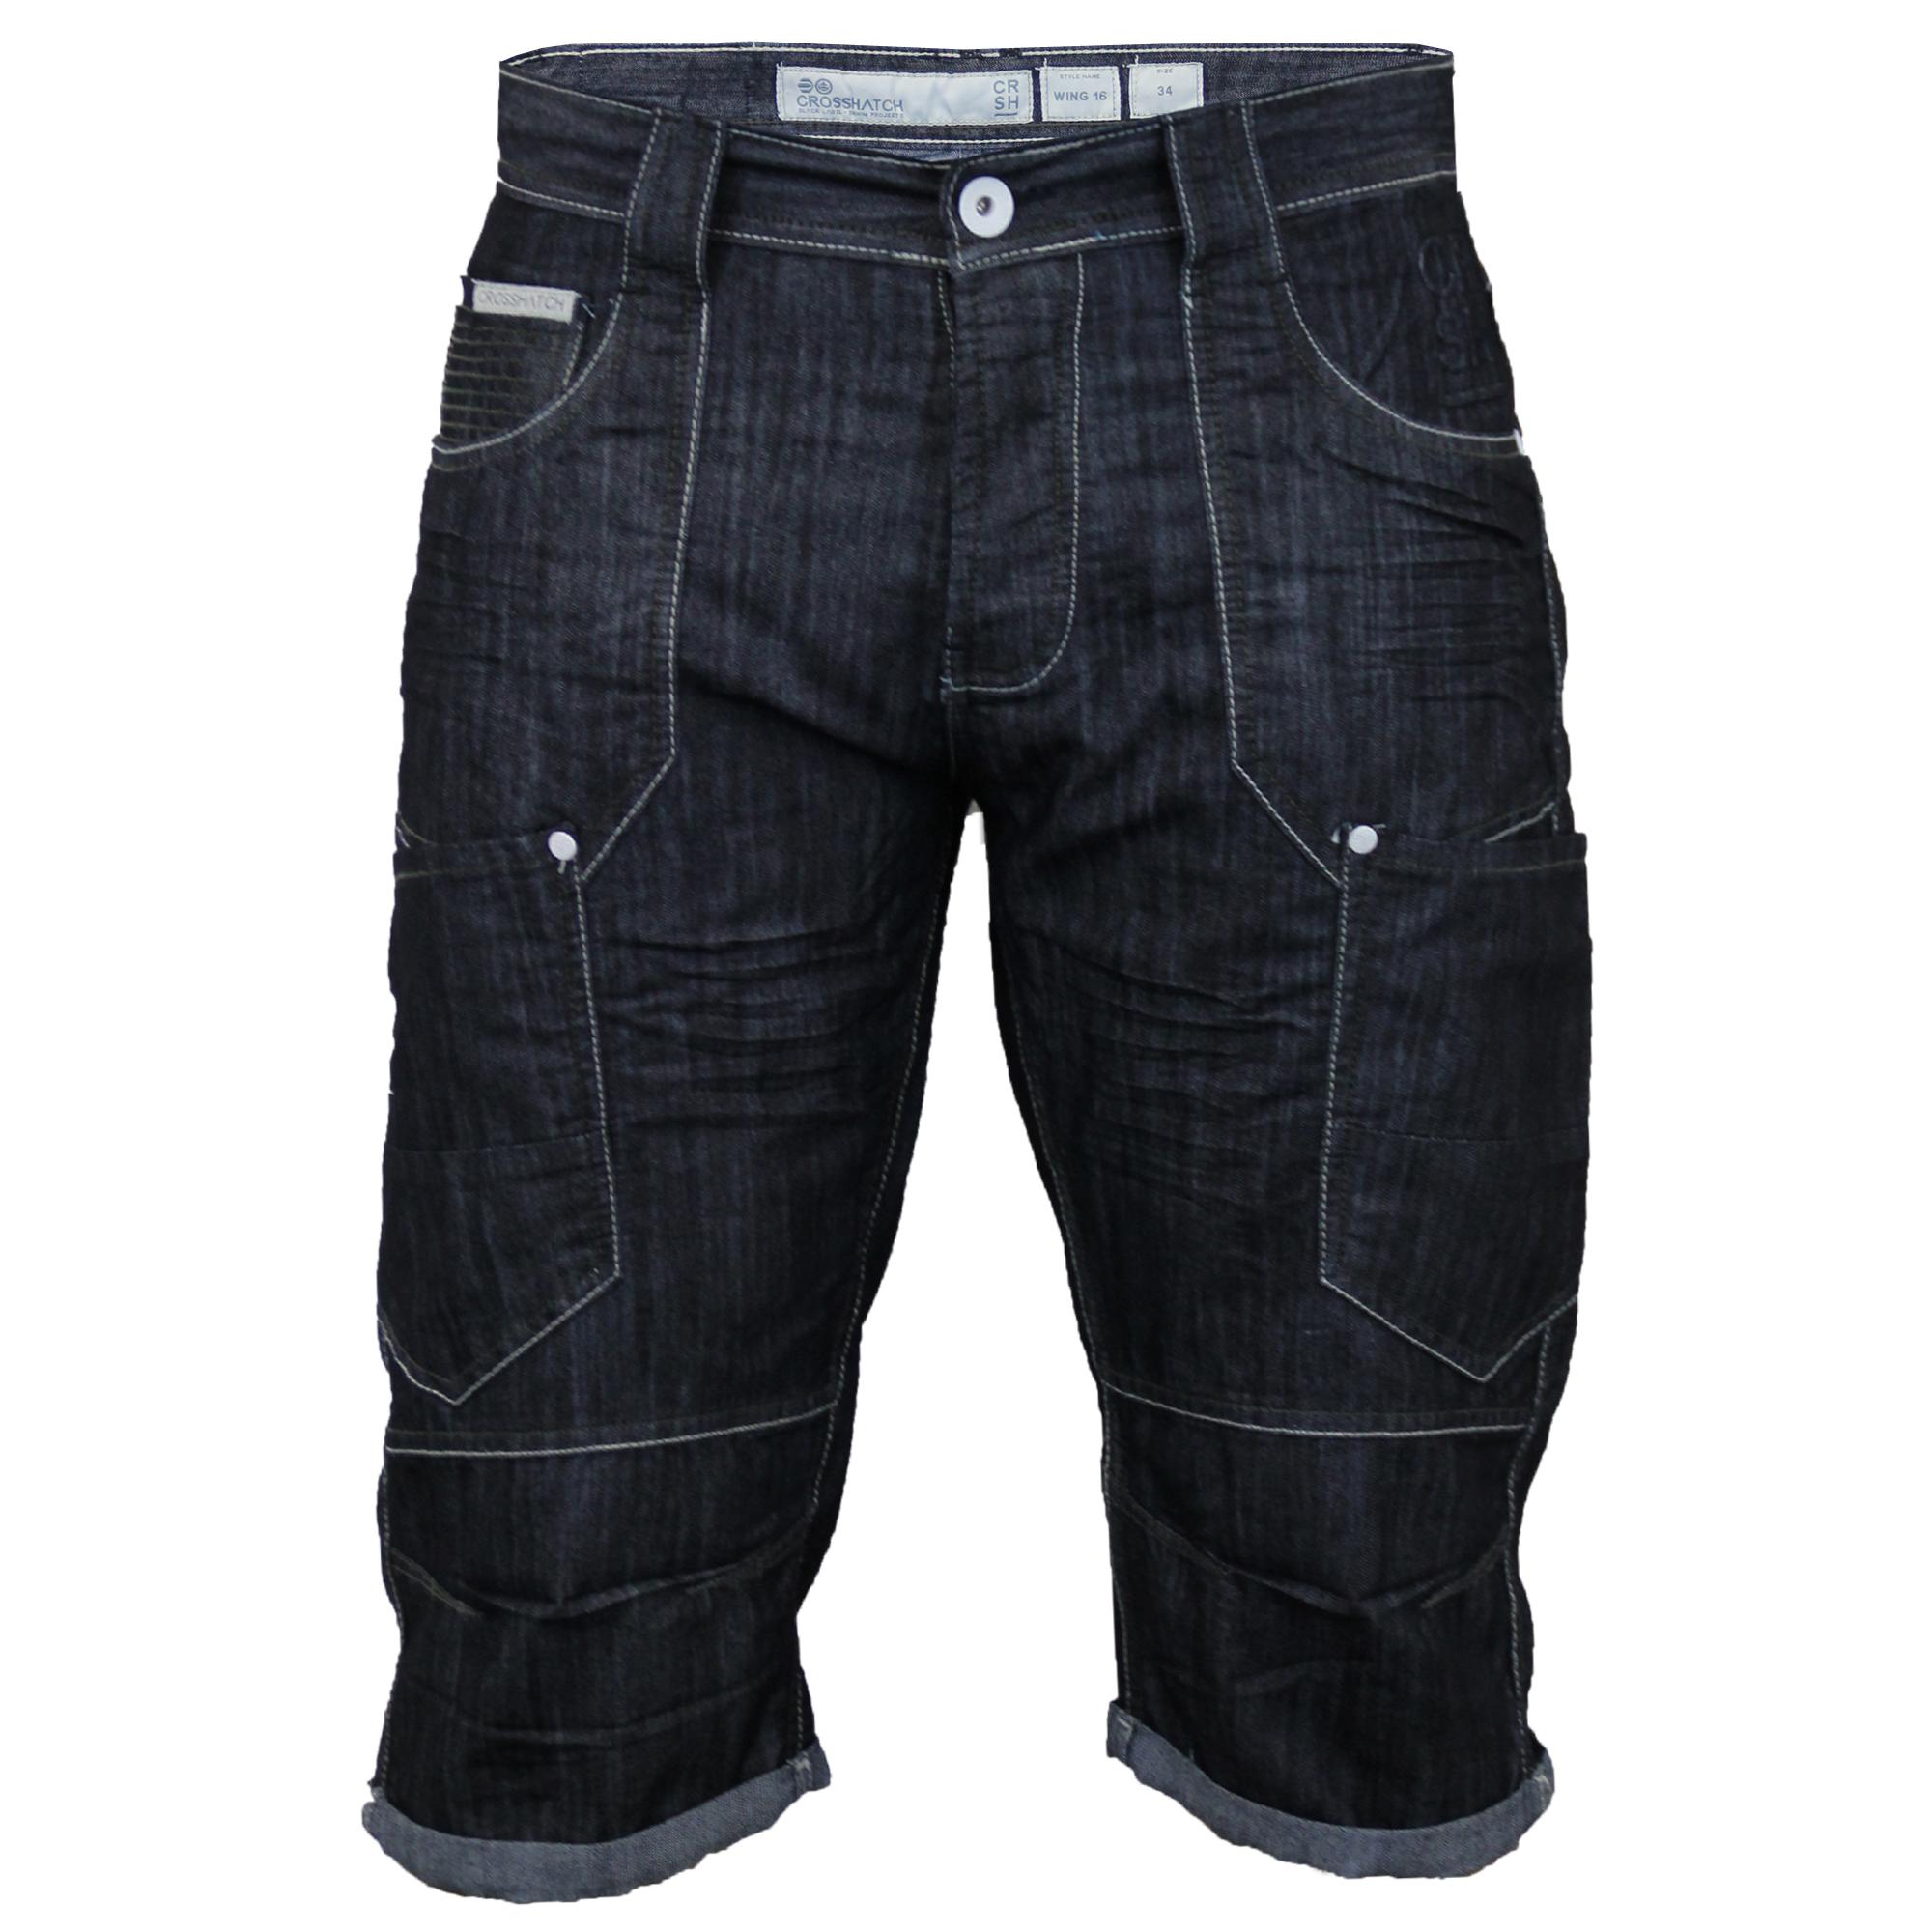 Mens-Crosshatch-Denim-Knee-Length-Combat-Shorts-Cargo-Casual-Fashion-Summer-New 縮圖 23